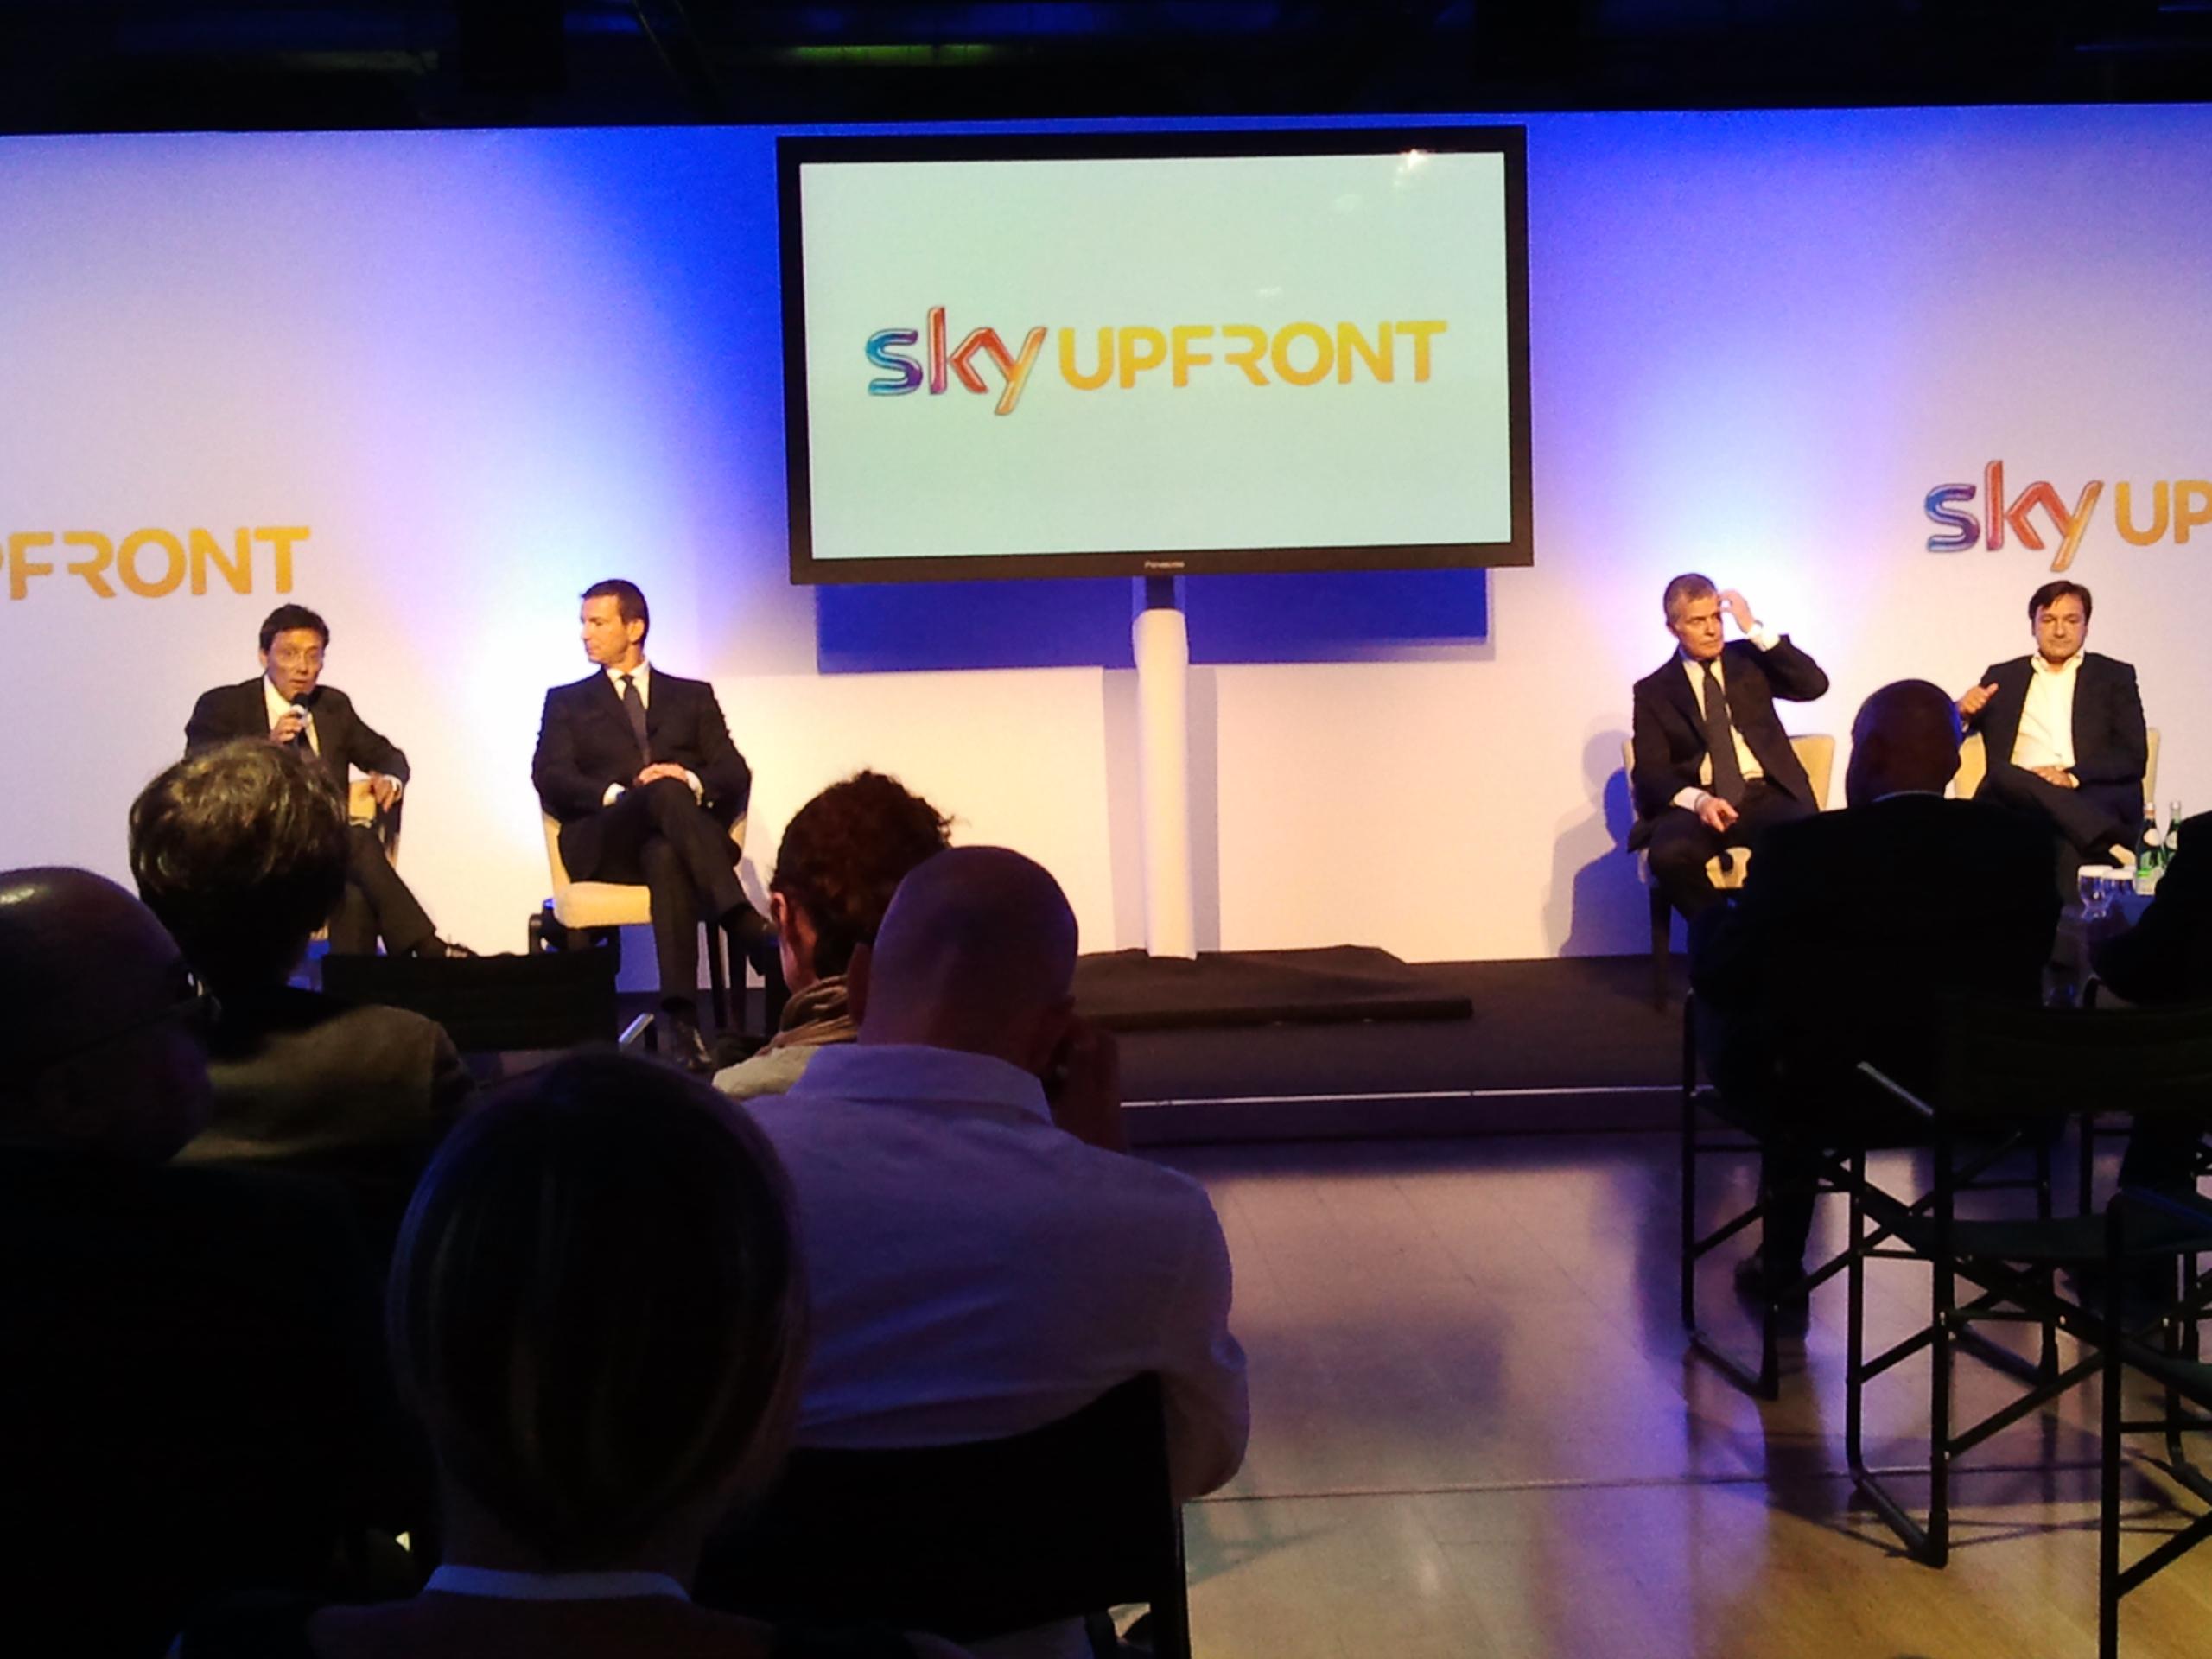 Sky Sport conferenza stampa di presentazione